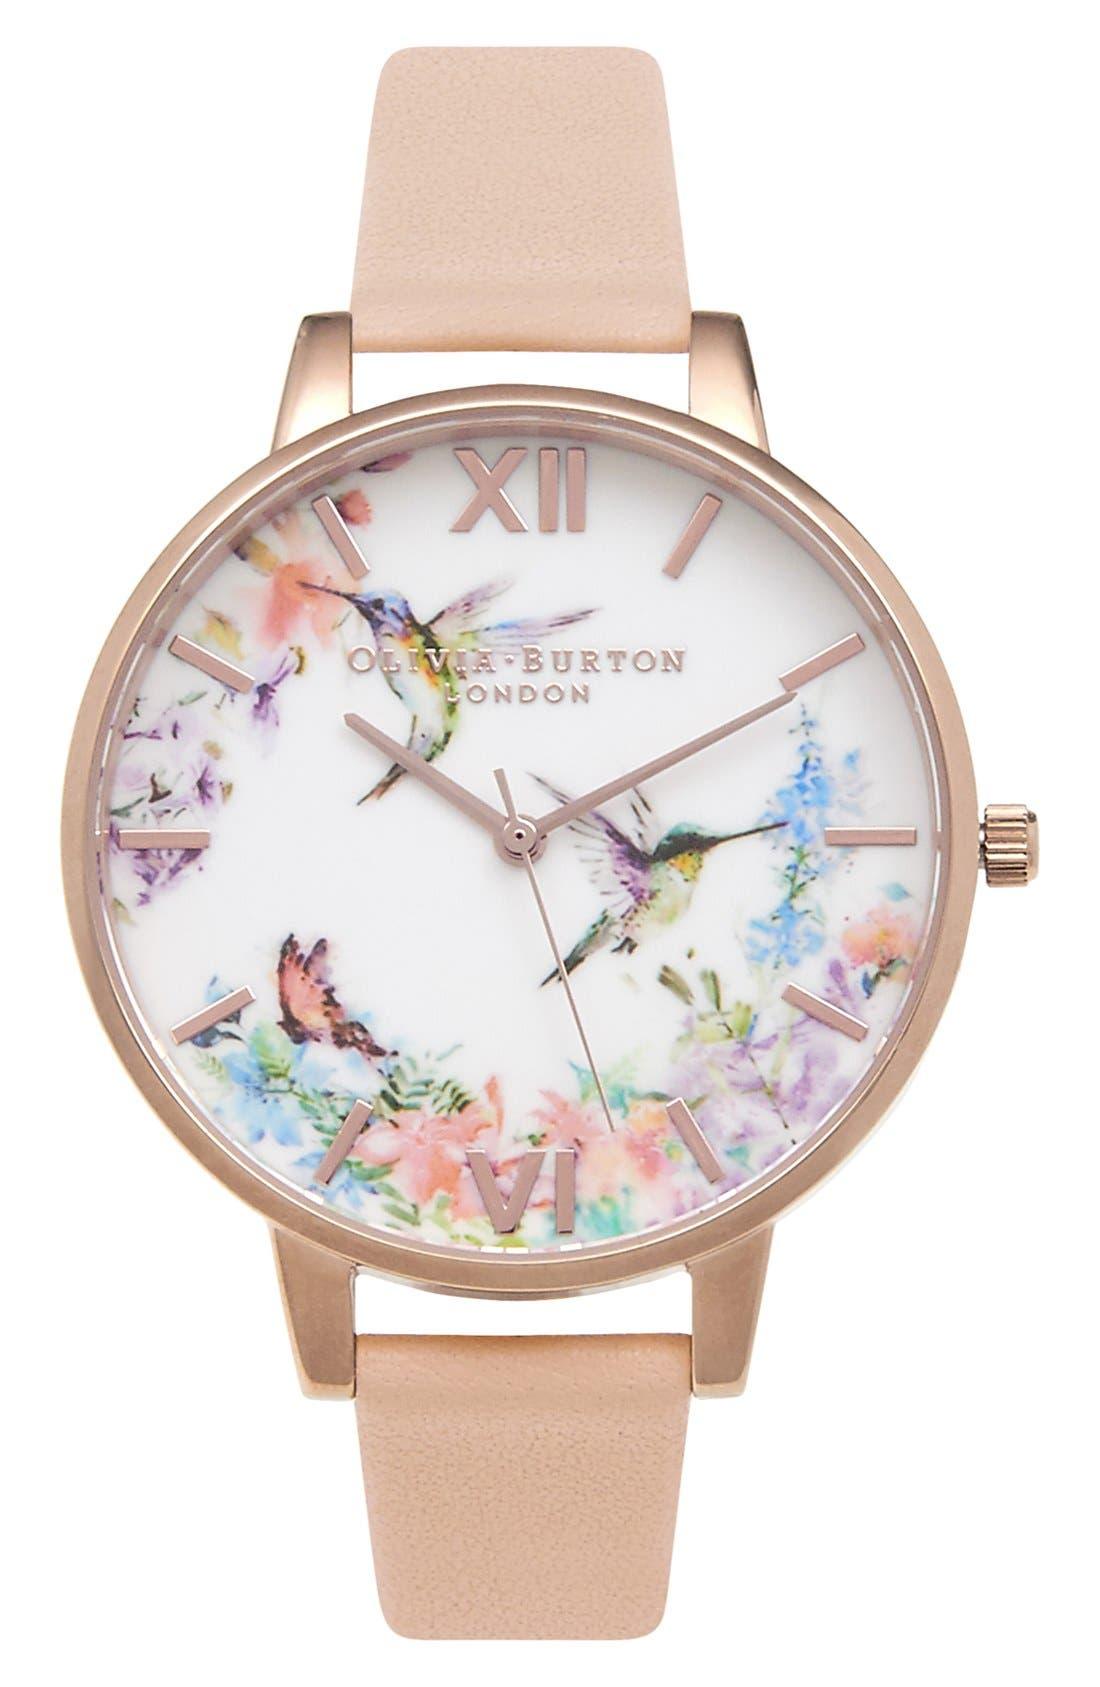 Olivia Burton 'Painterly Prints' Leather Strap Watch, 38mm